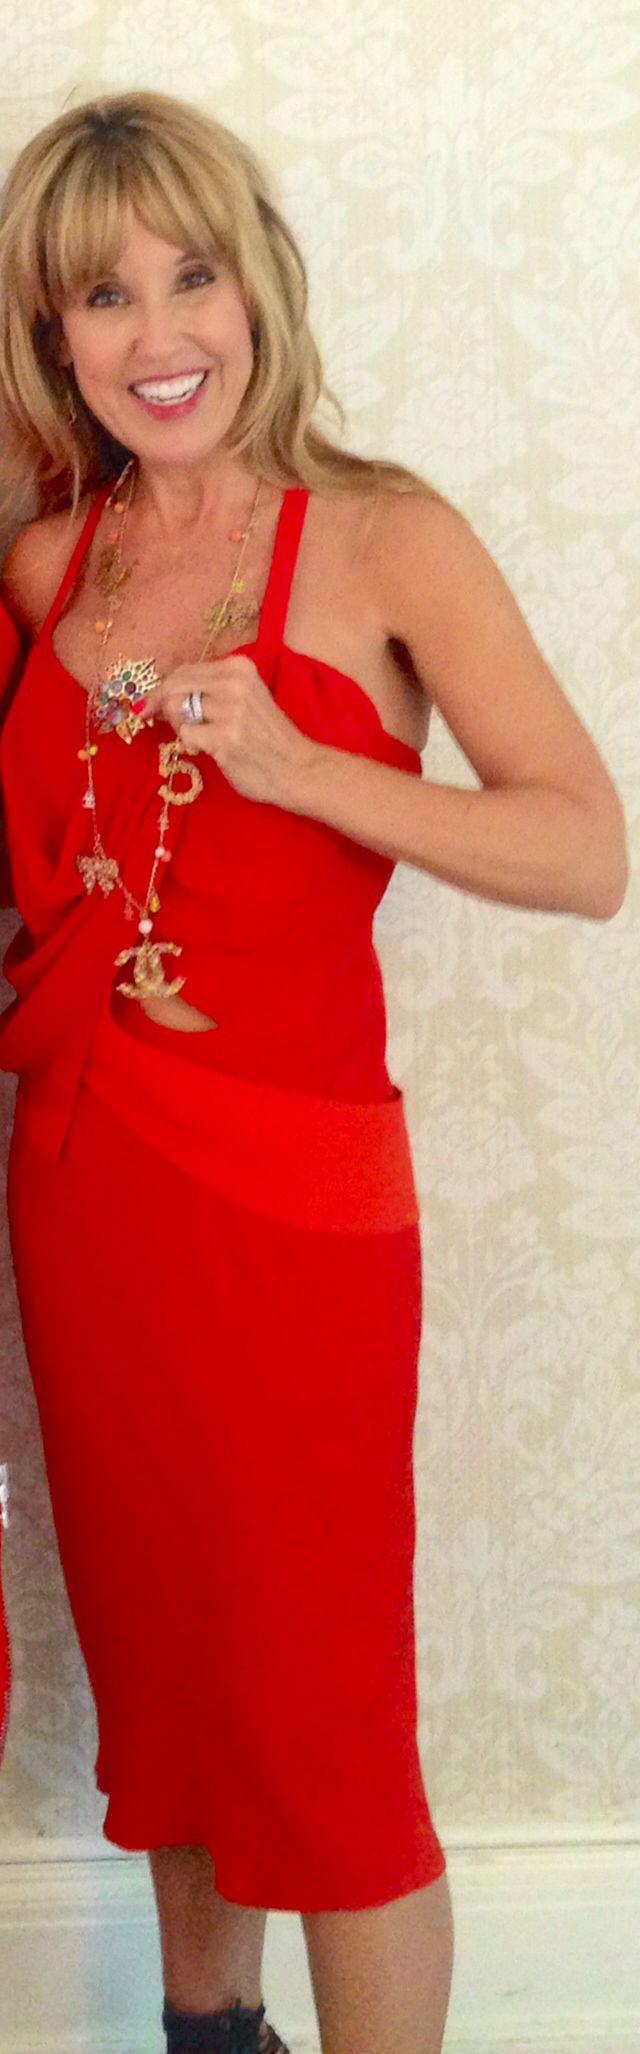 Chris constantine indigo red summer dress